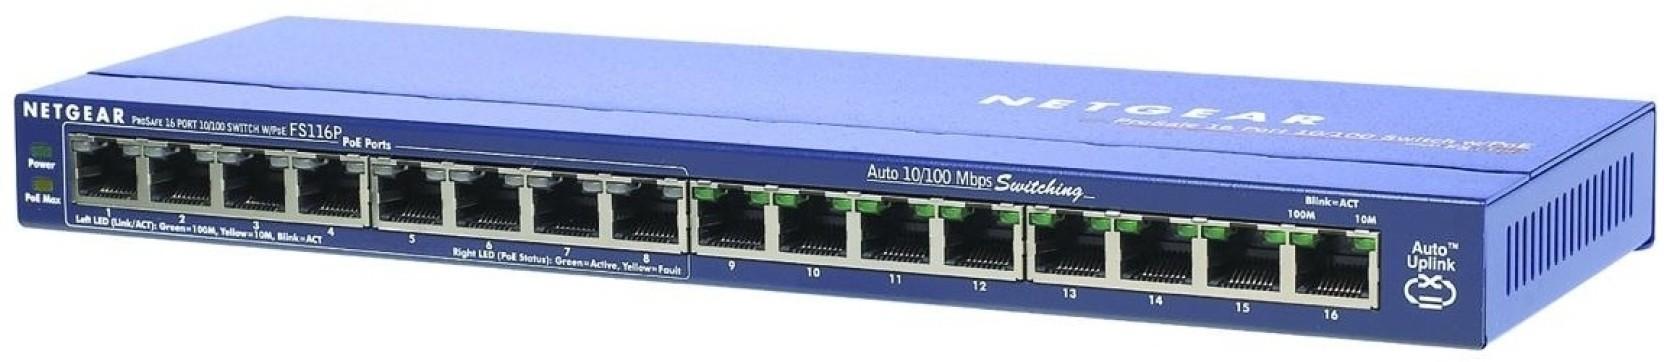 Netgear 16 Port POE Switch Network Switch - Netgear : Flipkart com